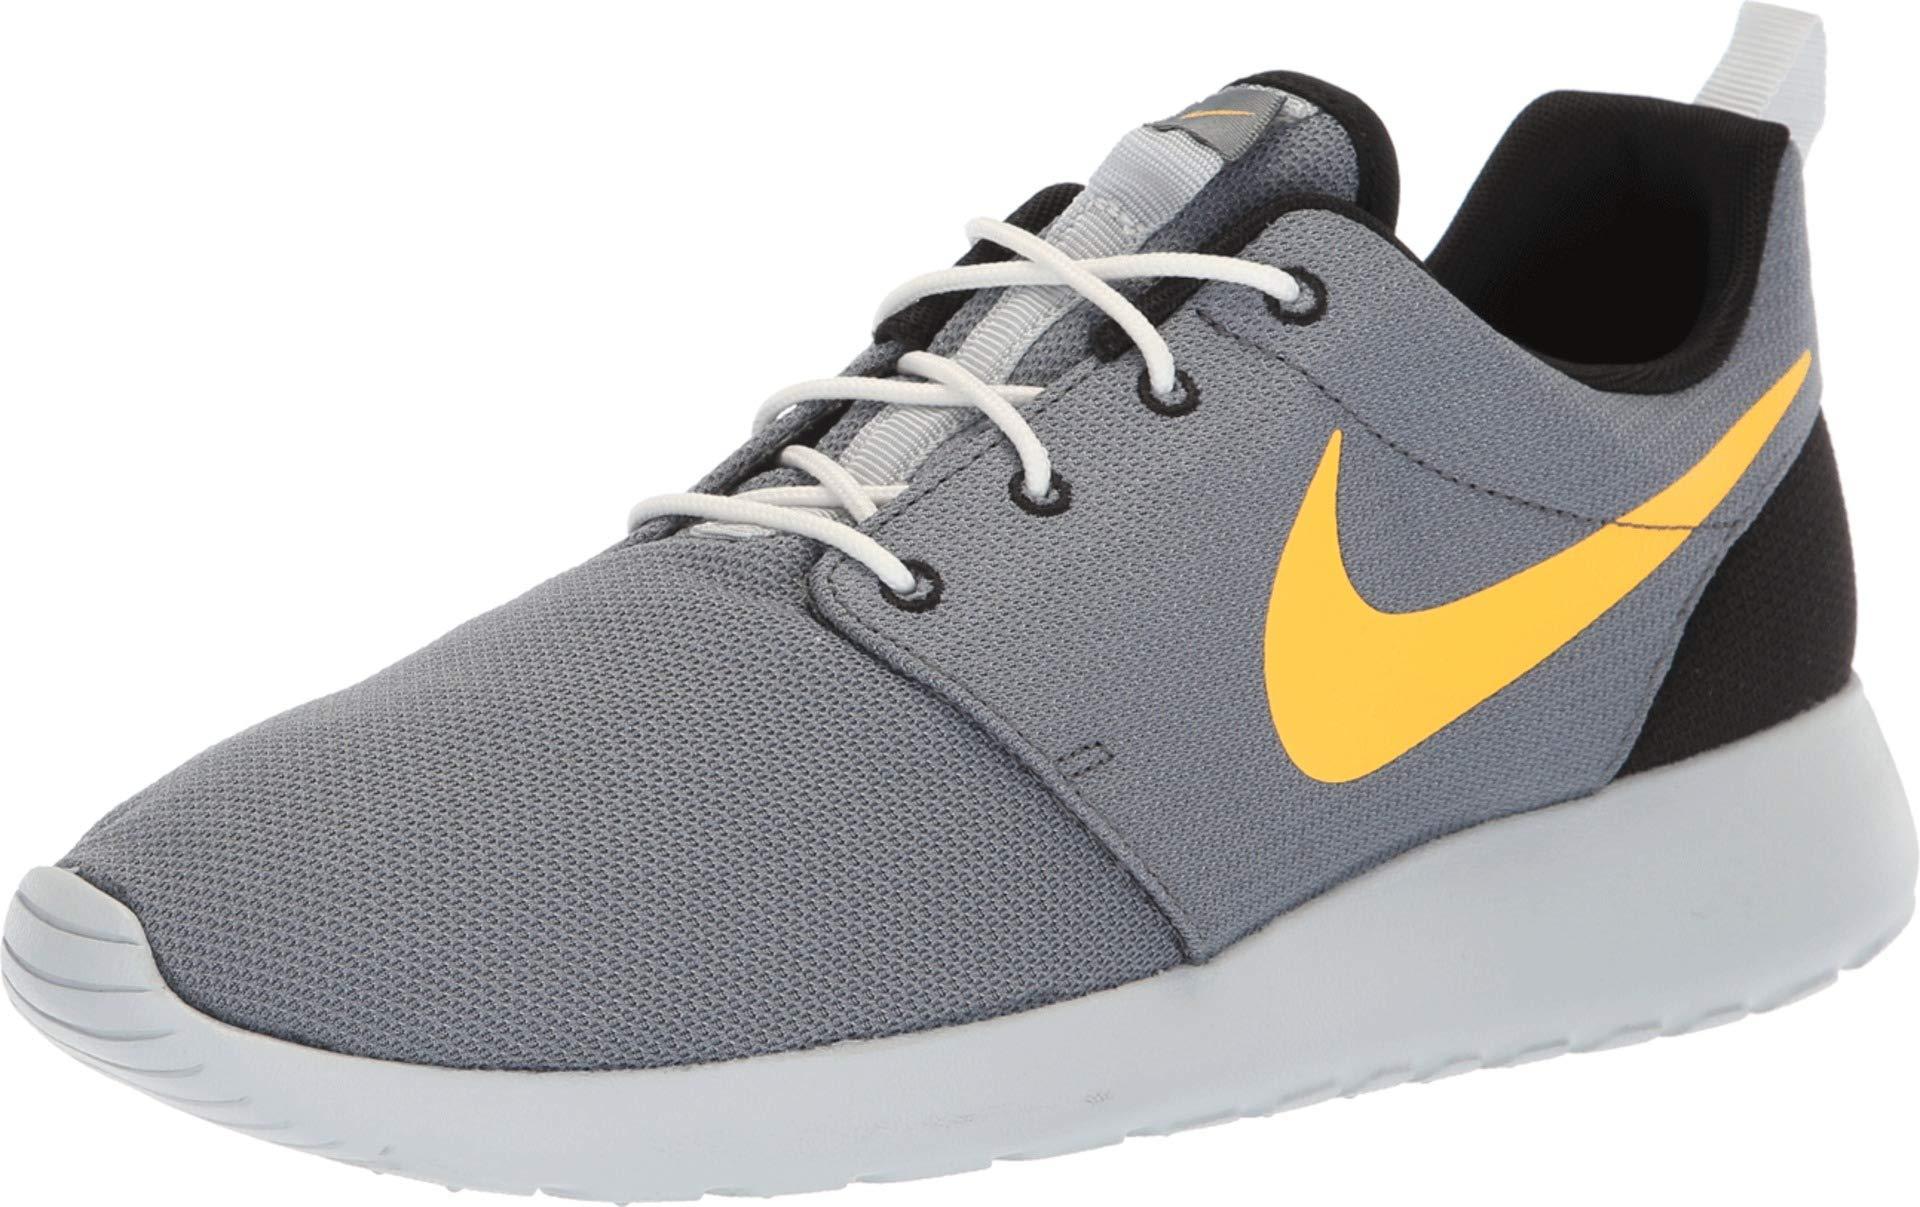 reputable site a5eac 78053 Galleon - Nike Men s Roshe One Running Shoes, Cool Grey Laser Orange-  Platinum, 12